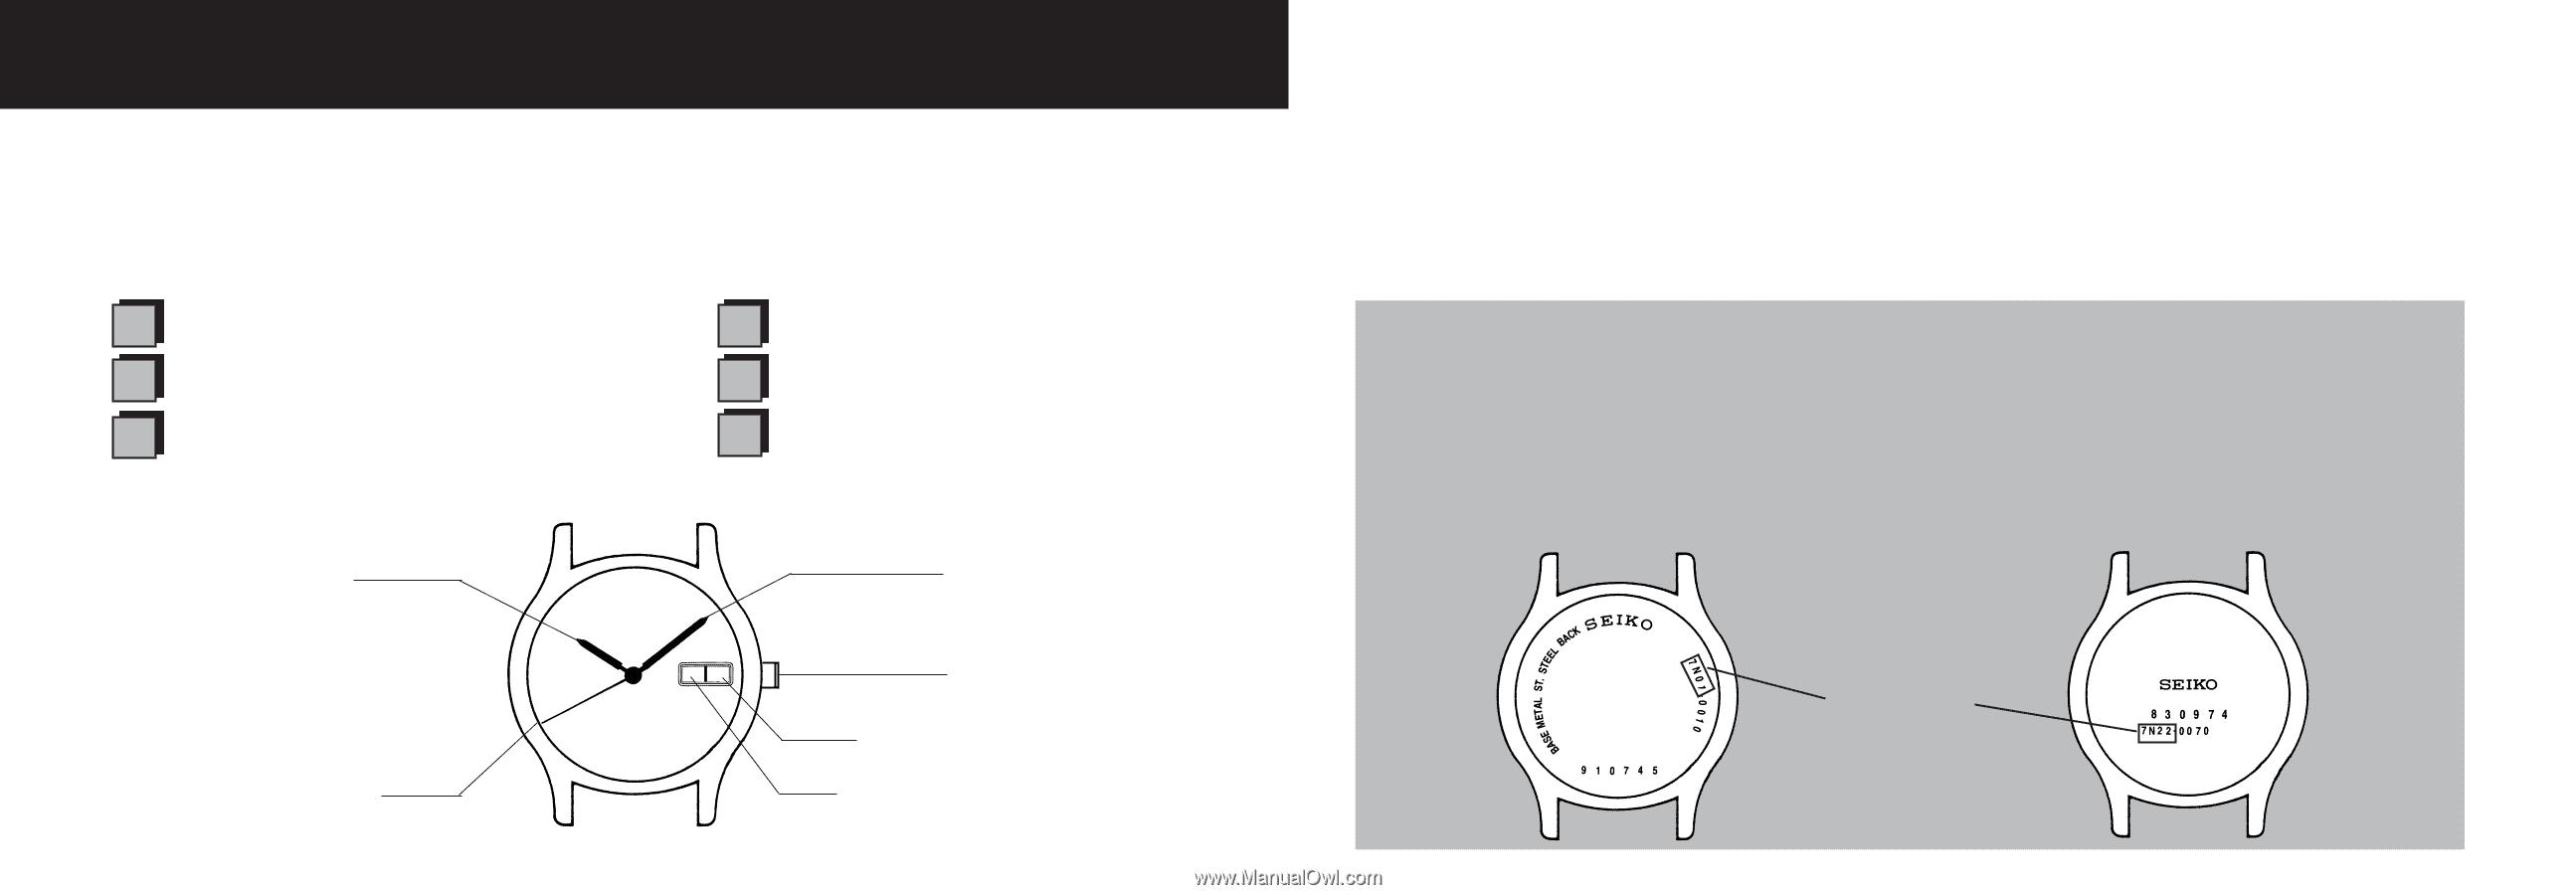 Seiko 7n82 Manual